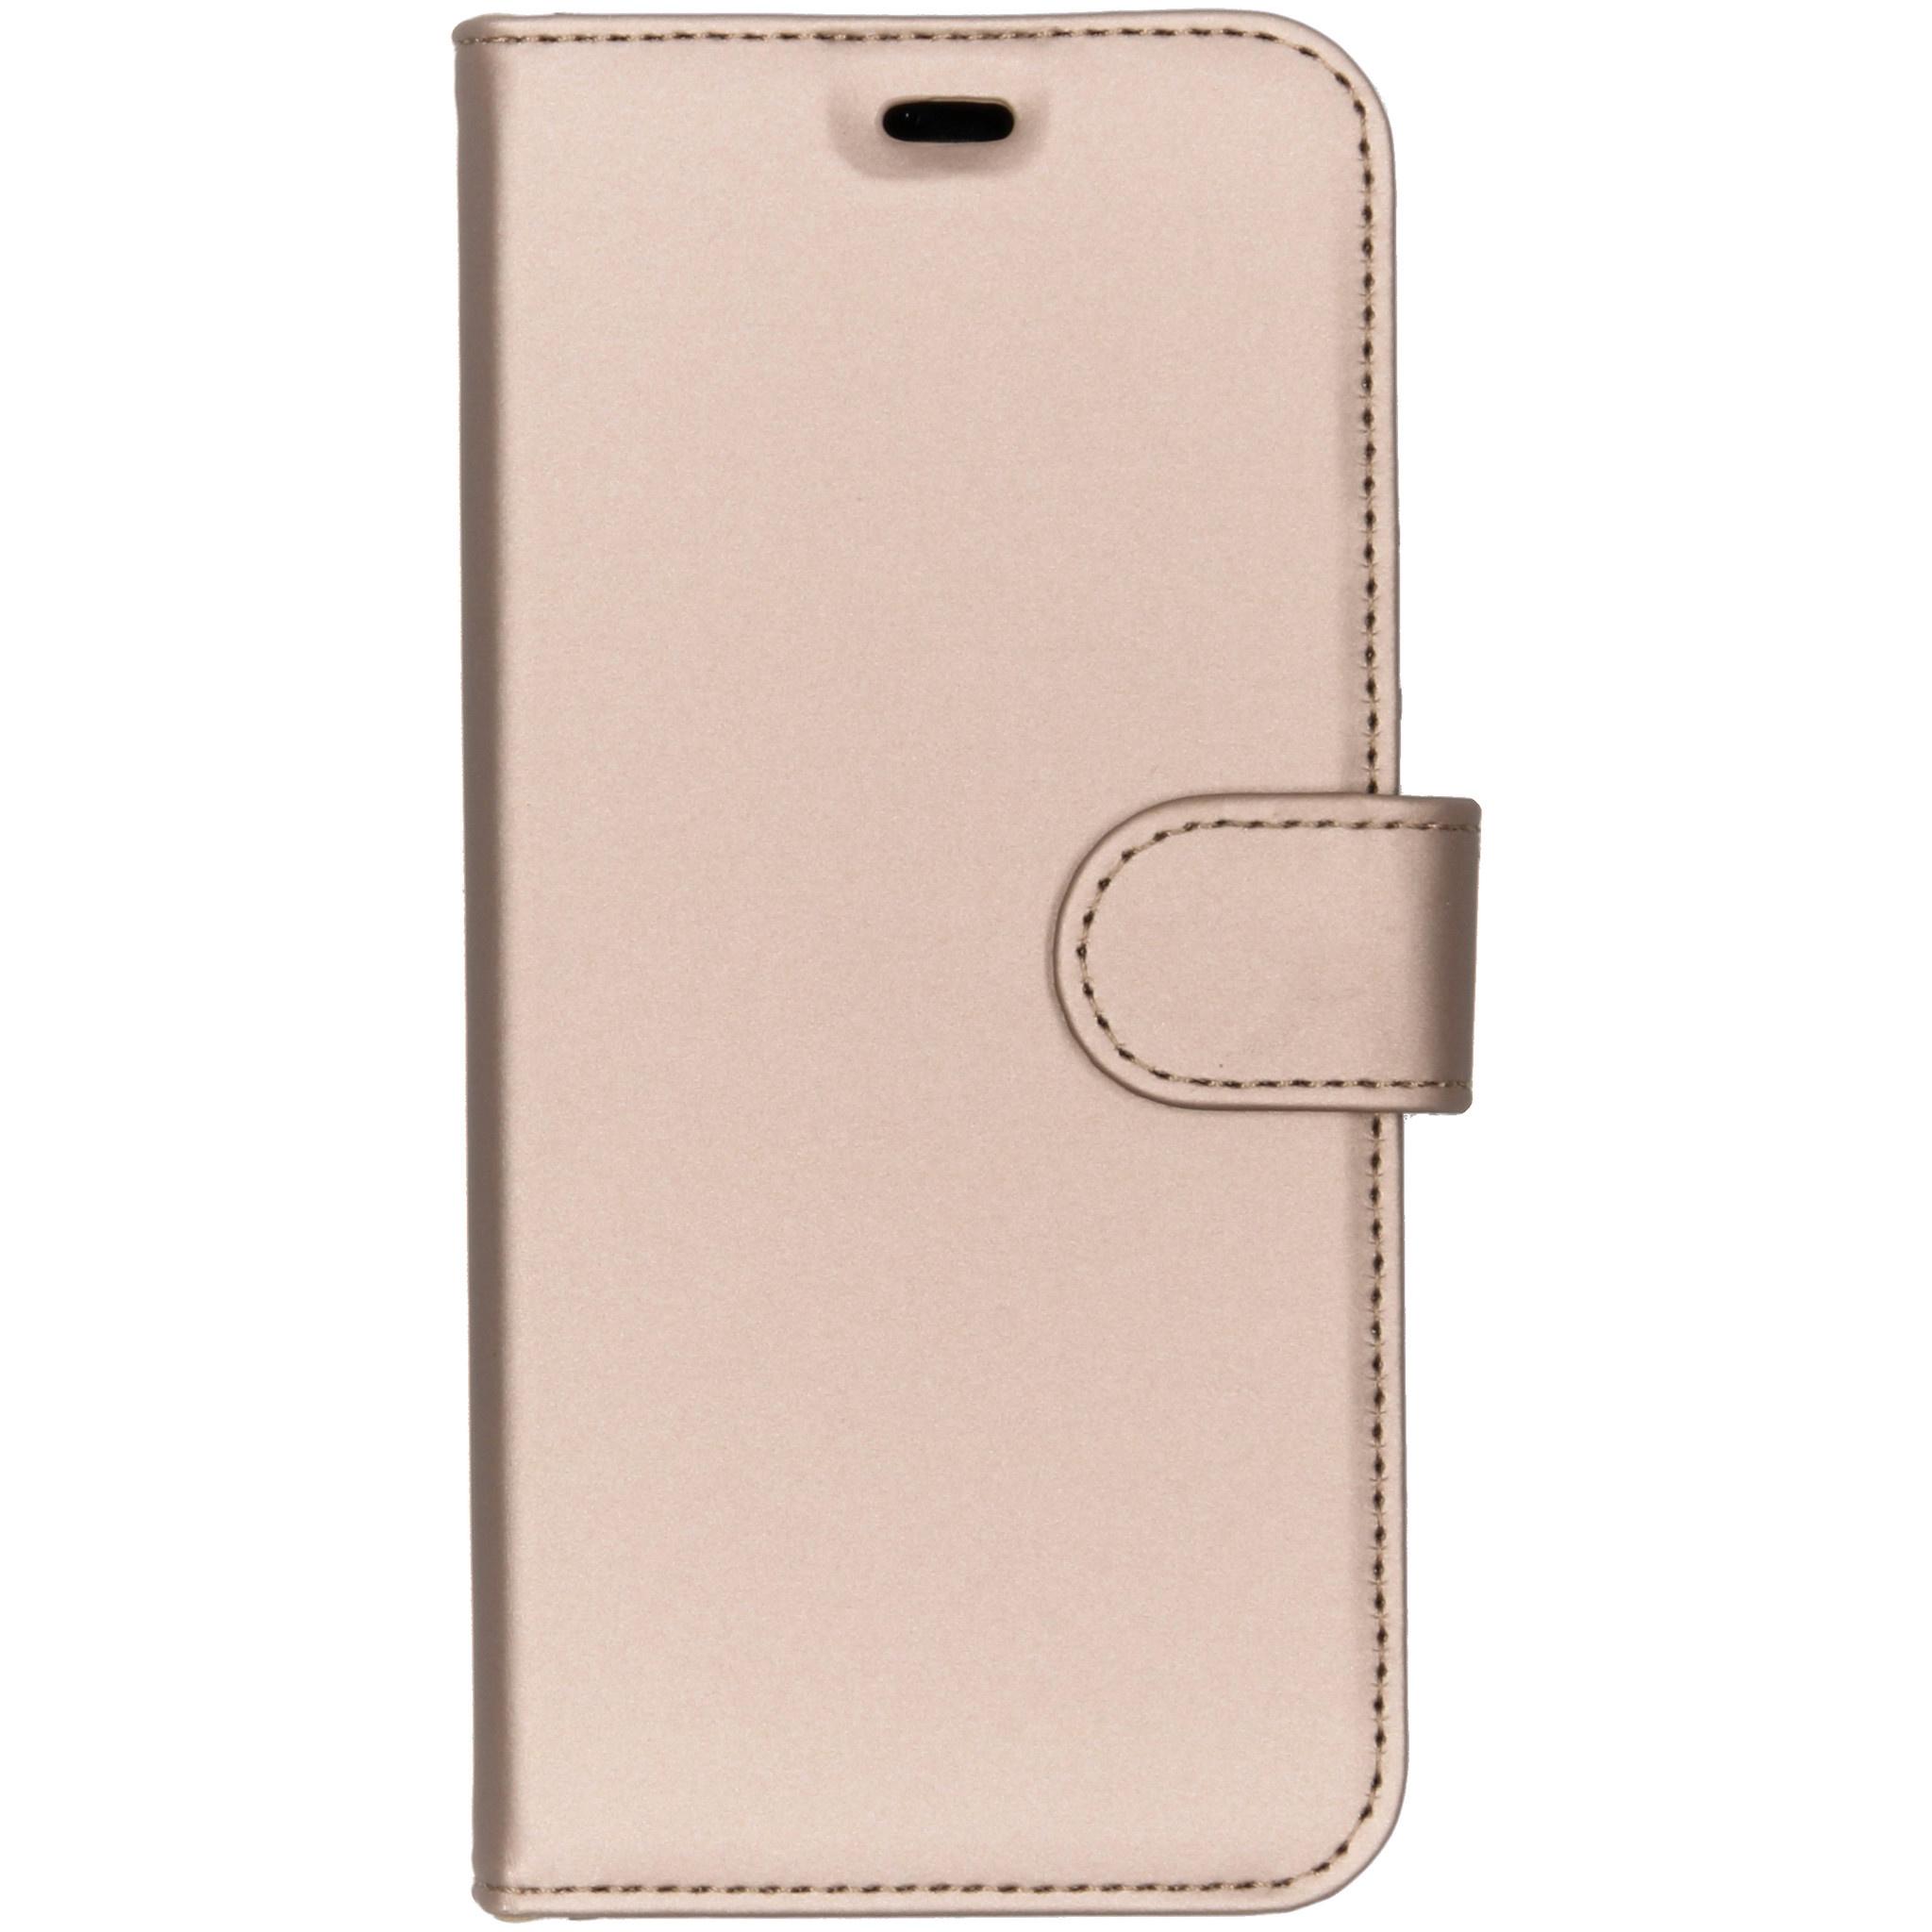 Accezz Goldfarbenes Wallet TPU Booklet für das Galaxy A6 (2018)